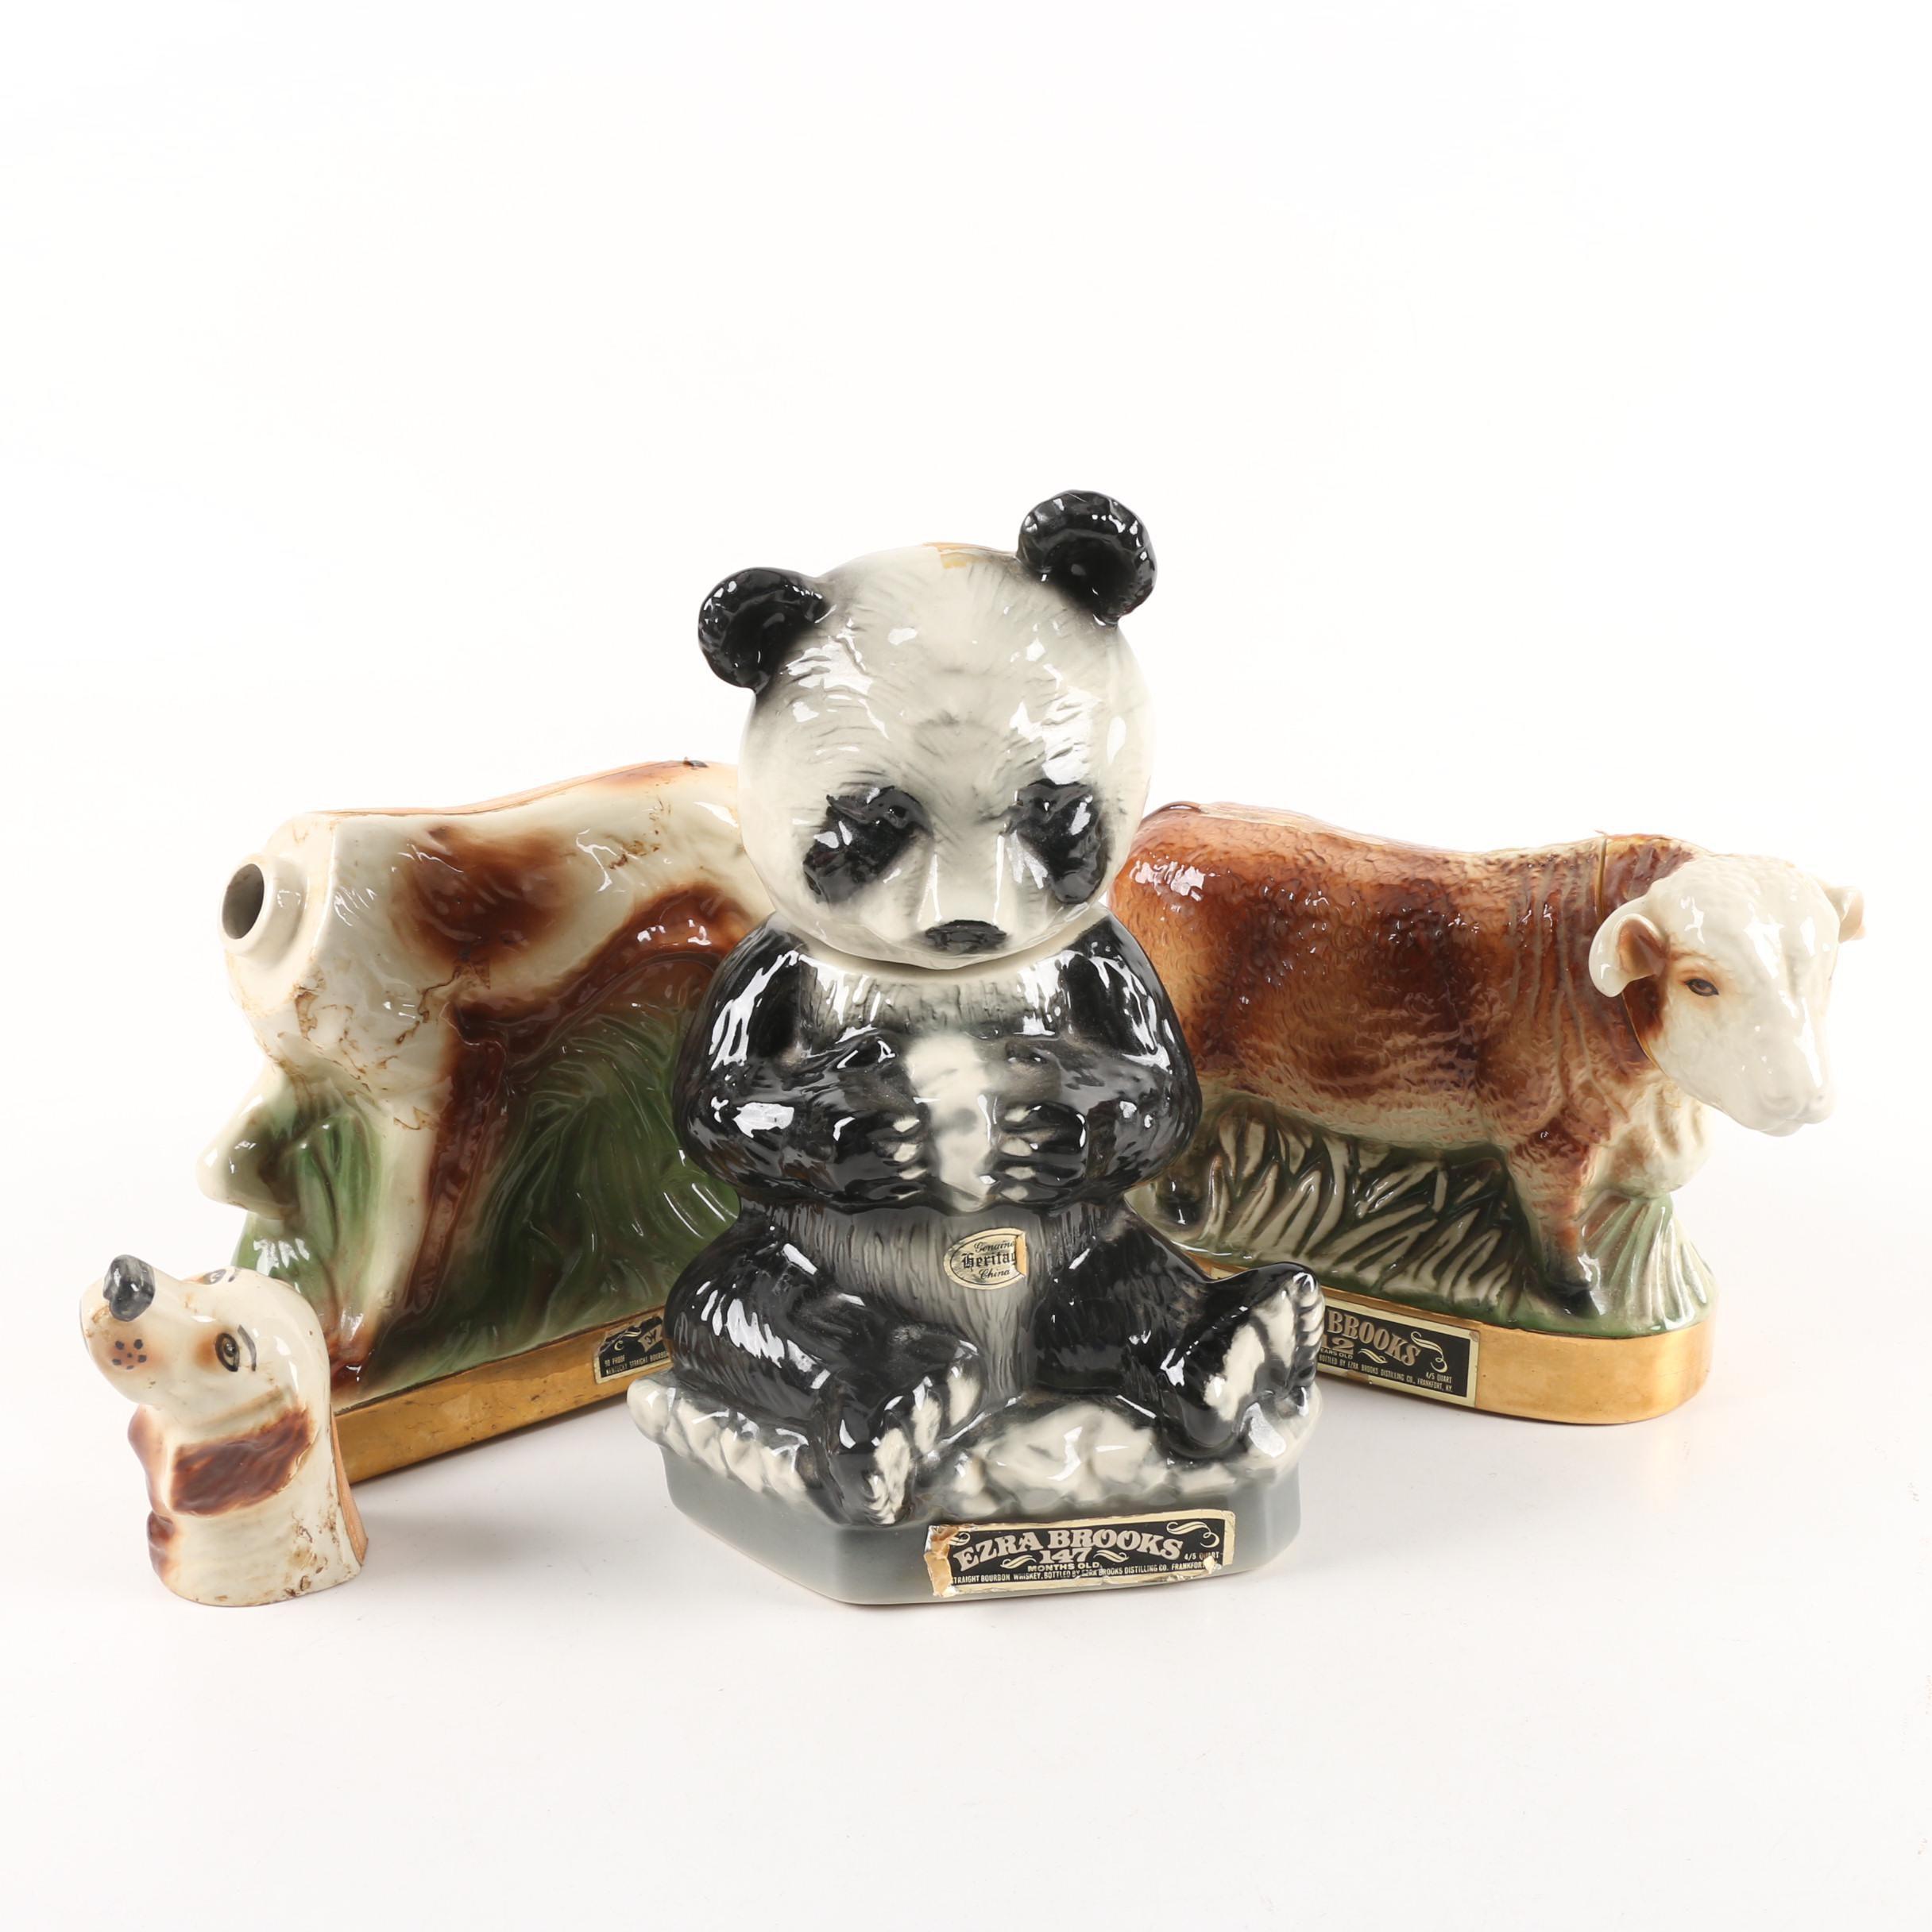 1970s Heritage China Ezra Brooks Whiskey Decanters